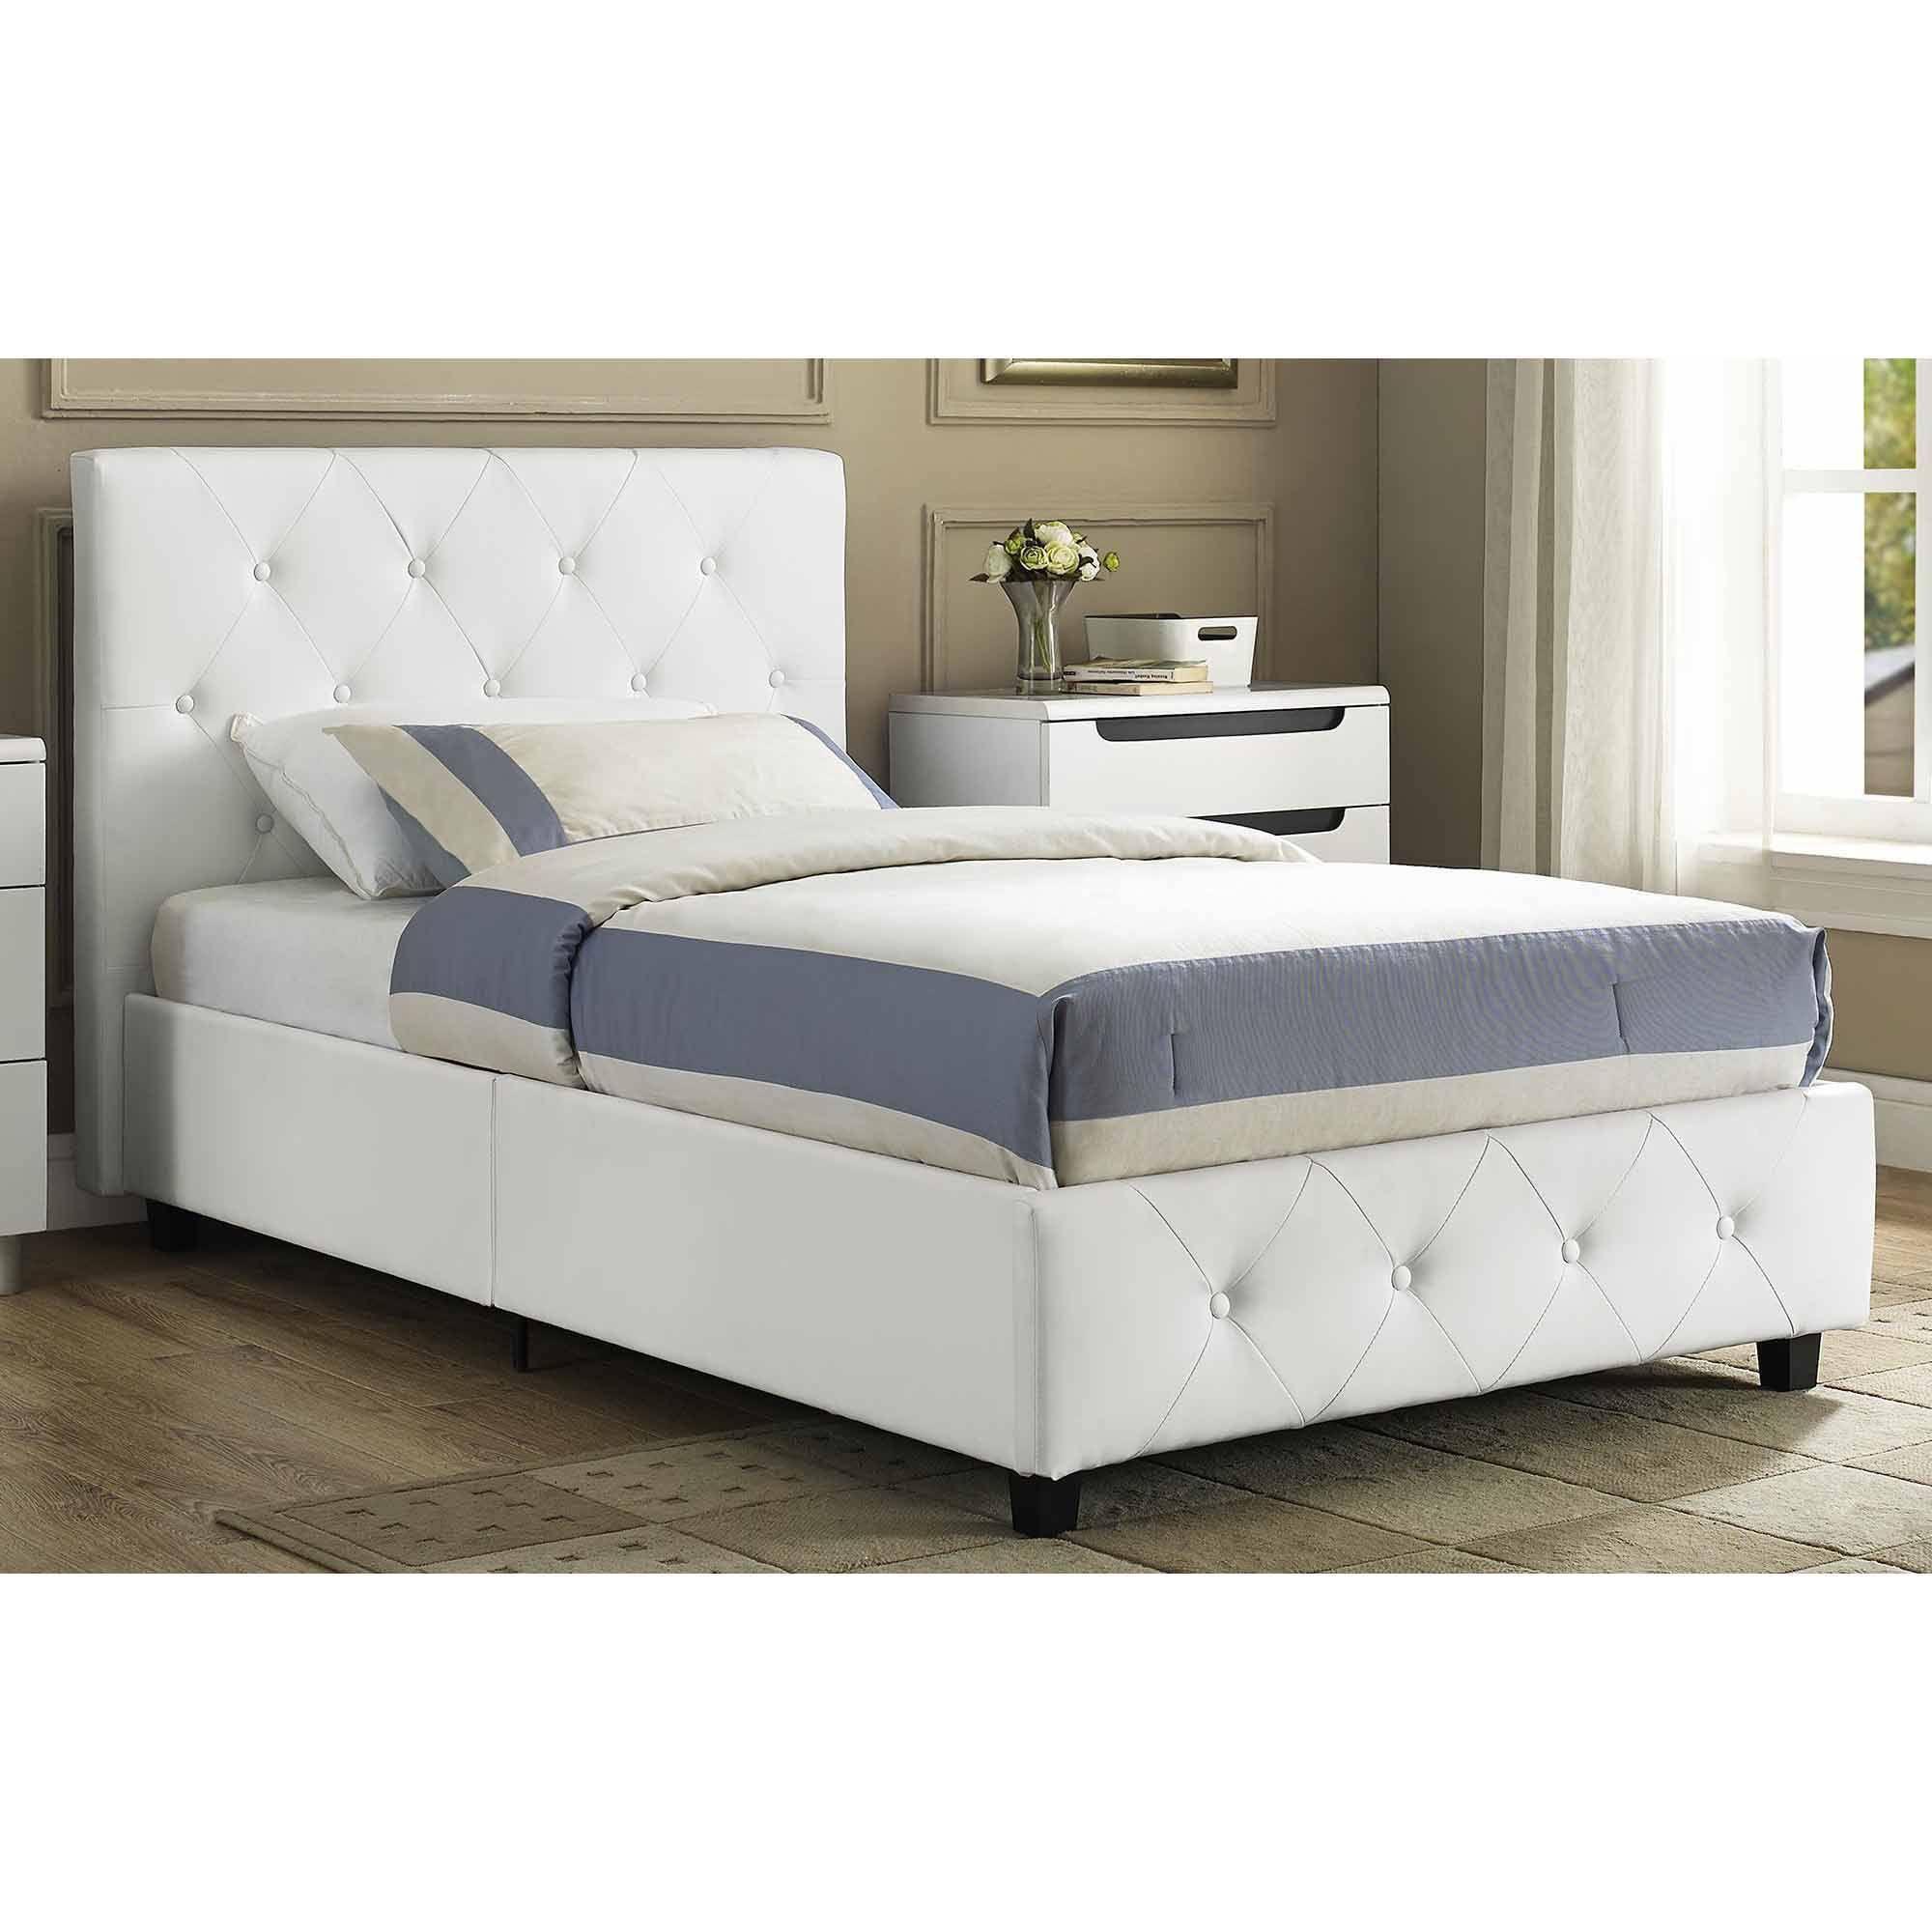 Dakota Faux Leather Upholstered Bed, White, Multiple Sizes Deal ...